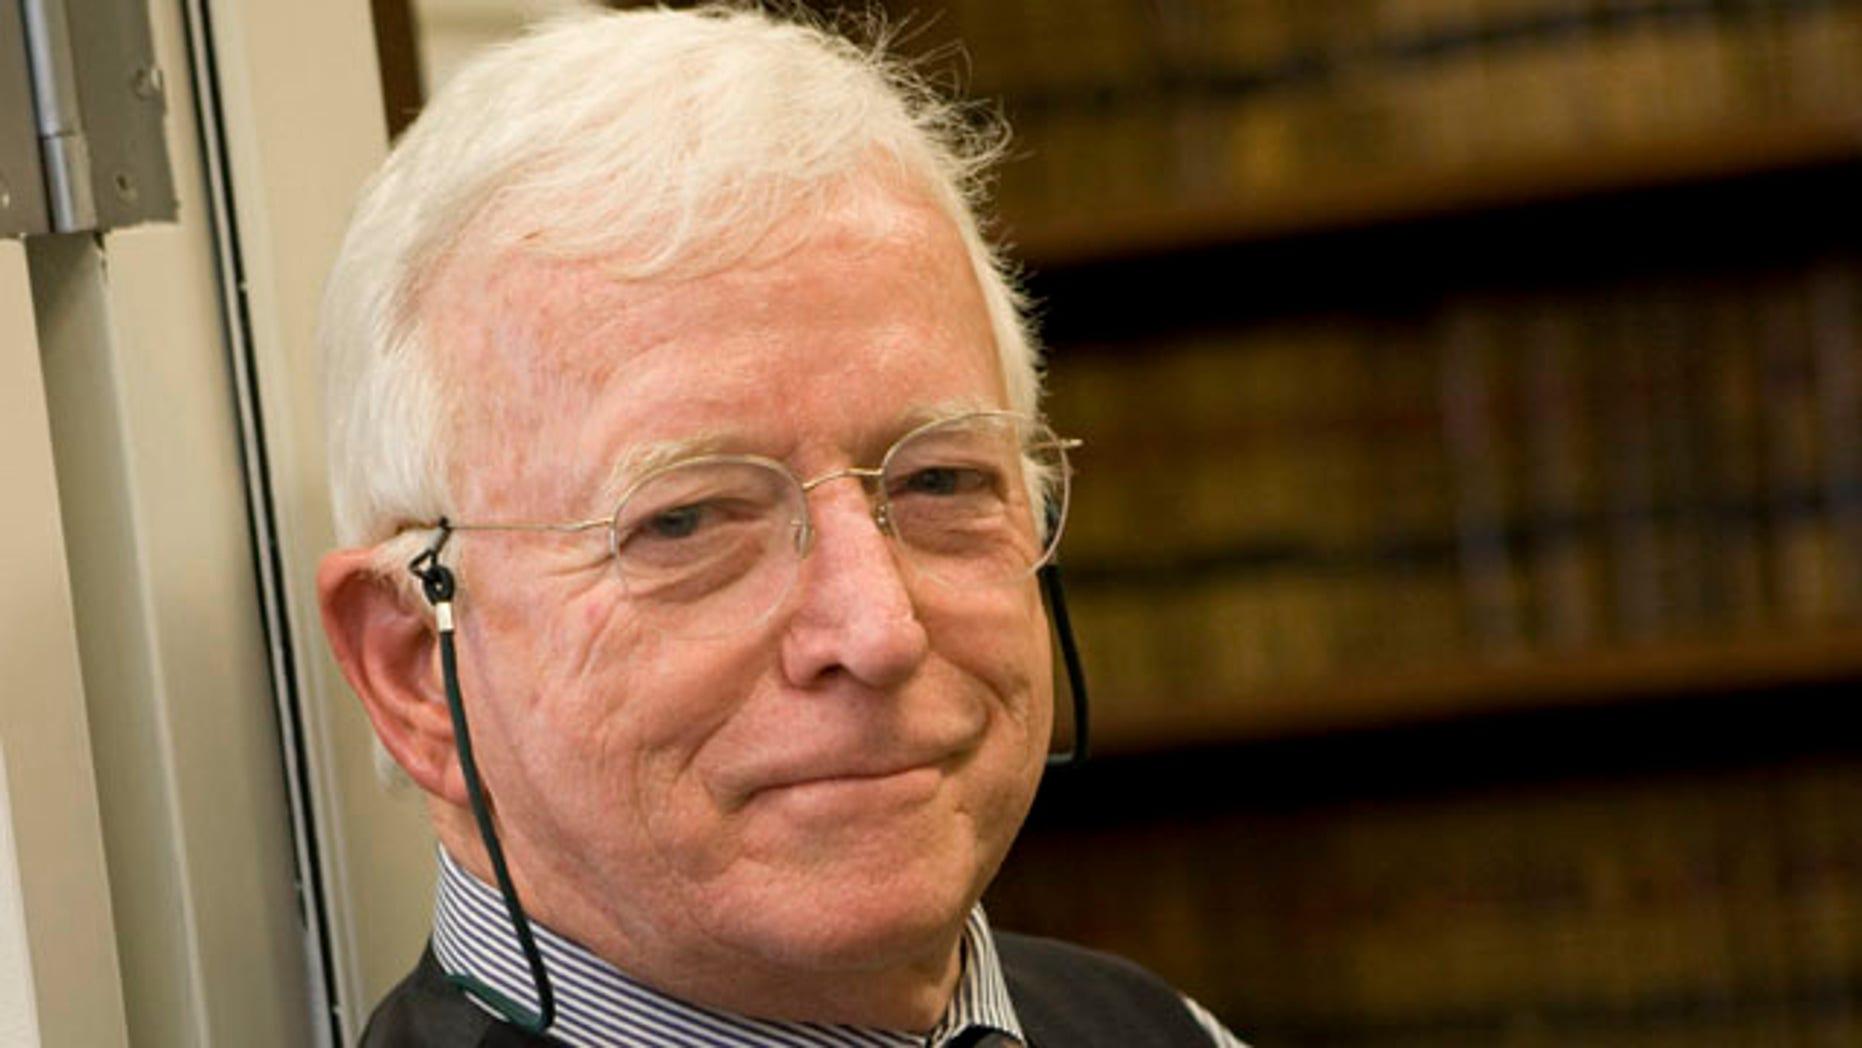 In this November 20, 2008 photo, Senior U.S. District Judge Jack T. Camp poses for a photo in Atlanta.